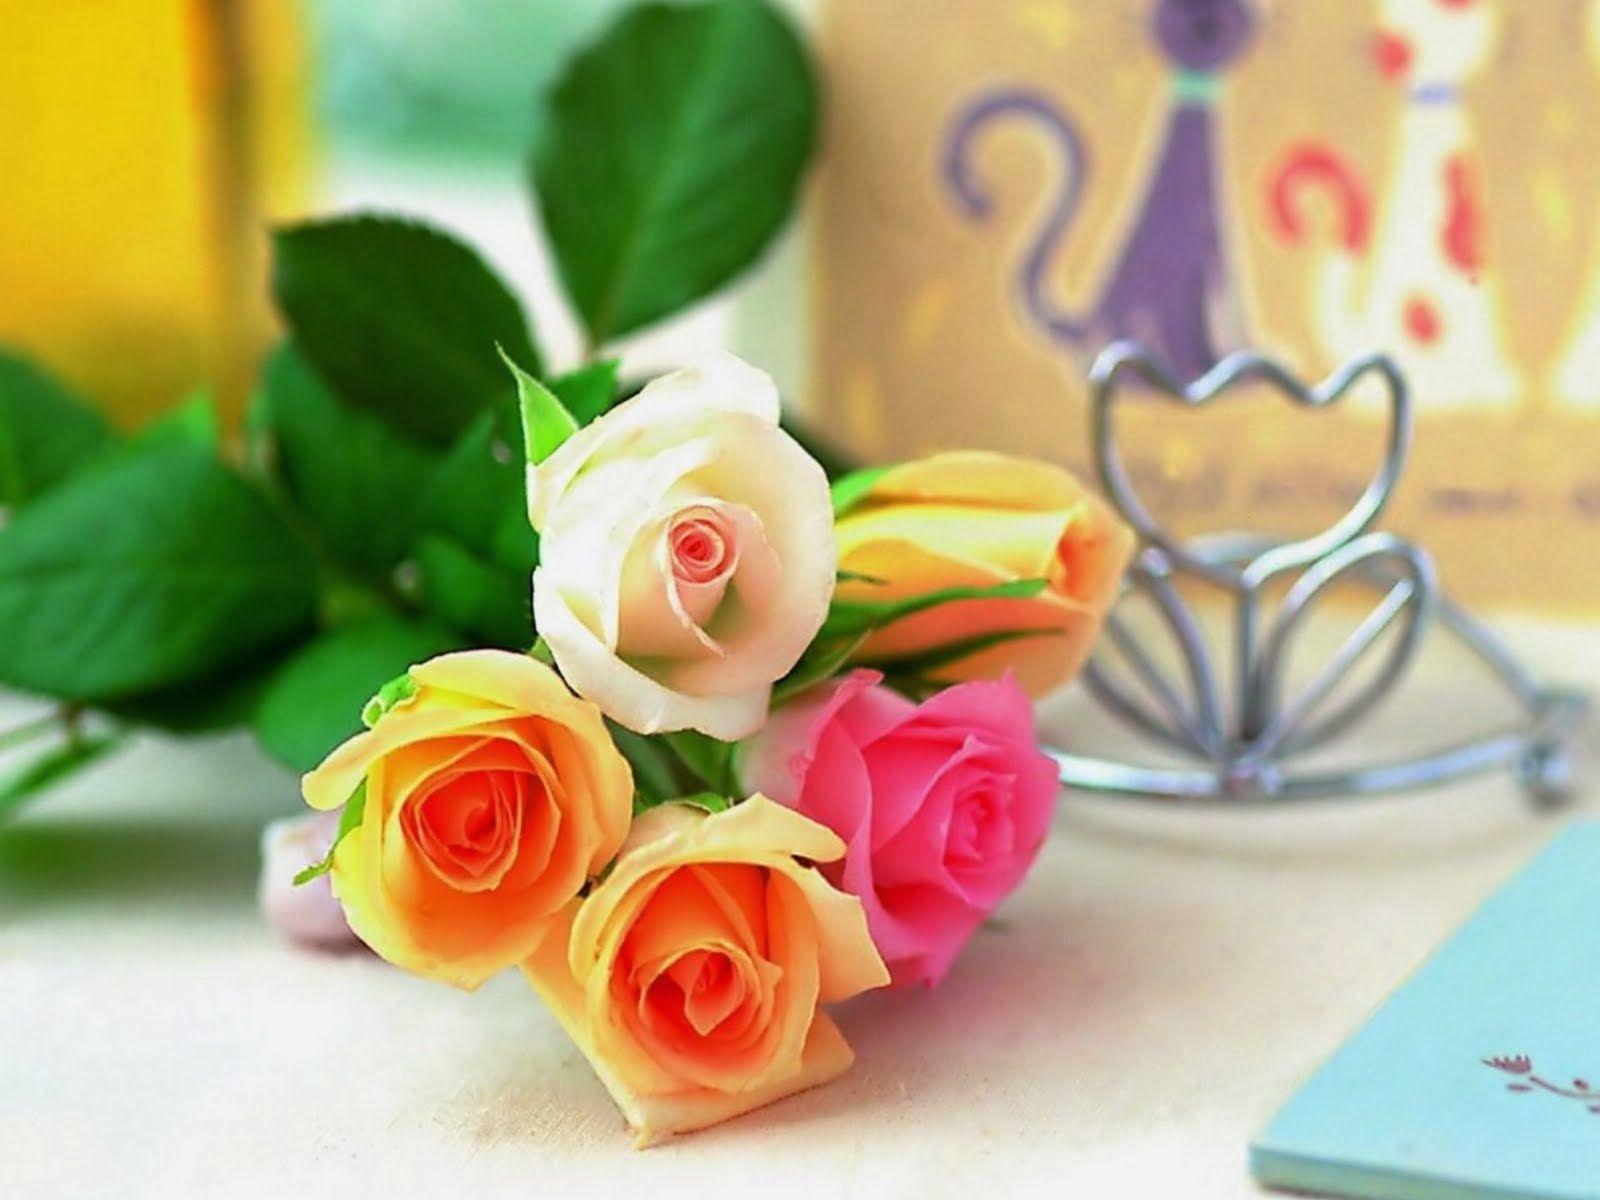 Beautiful flower wallpapers most beautiful flowers in the world beautiful flower wallpapers most beautiful flowers in the world izmirmasajfo